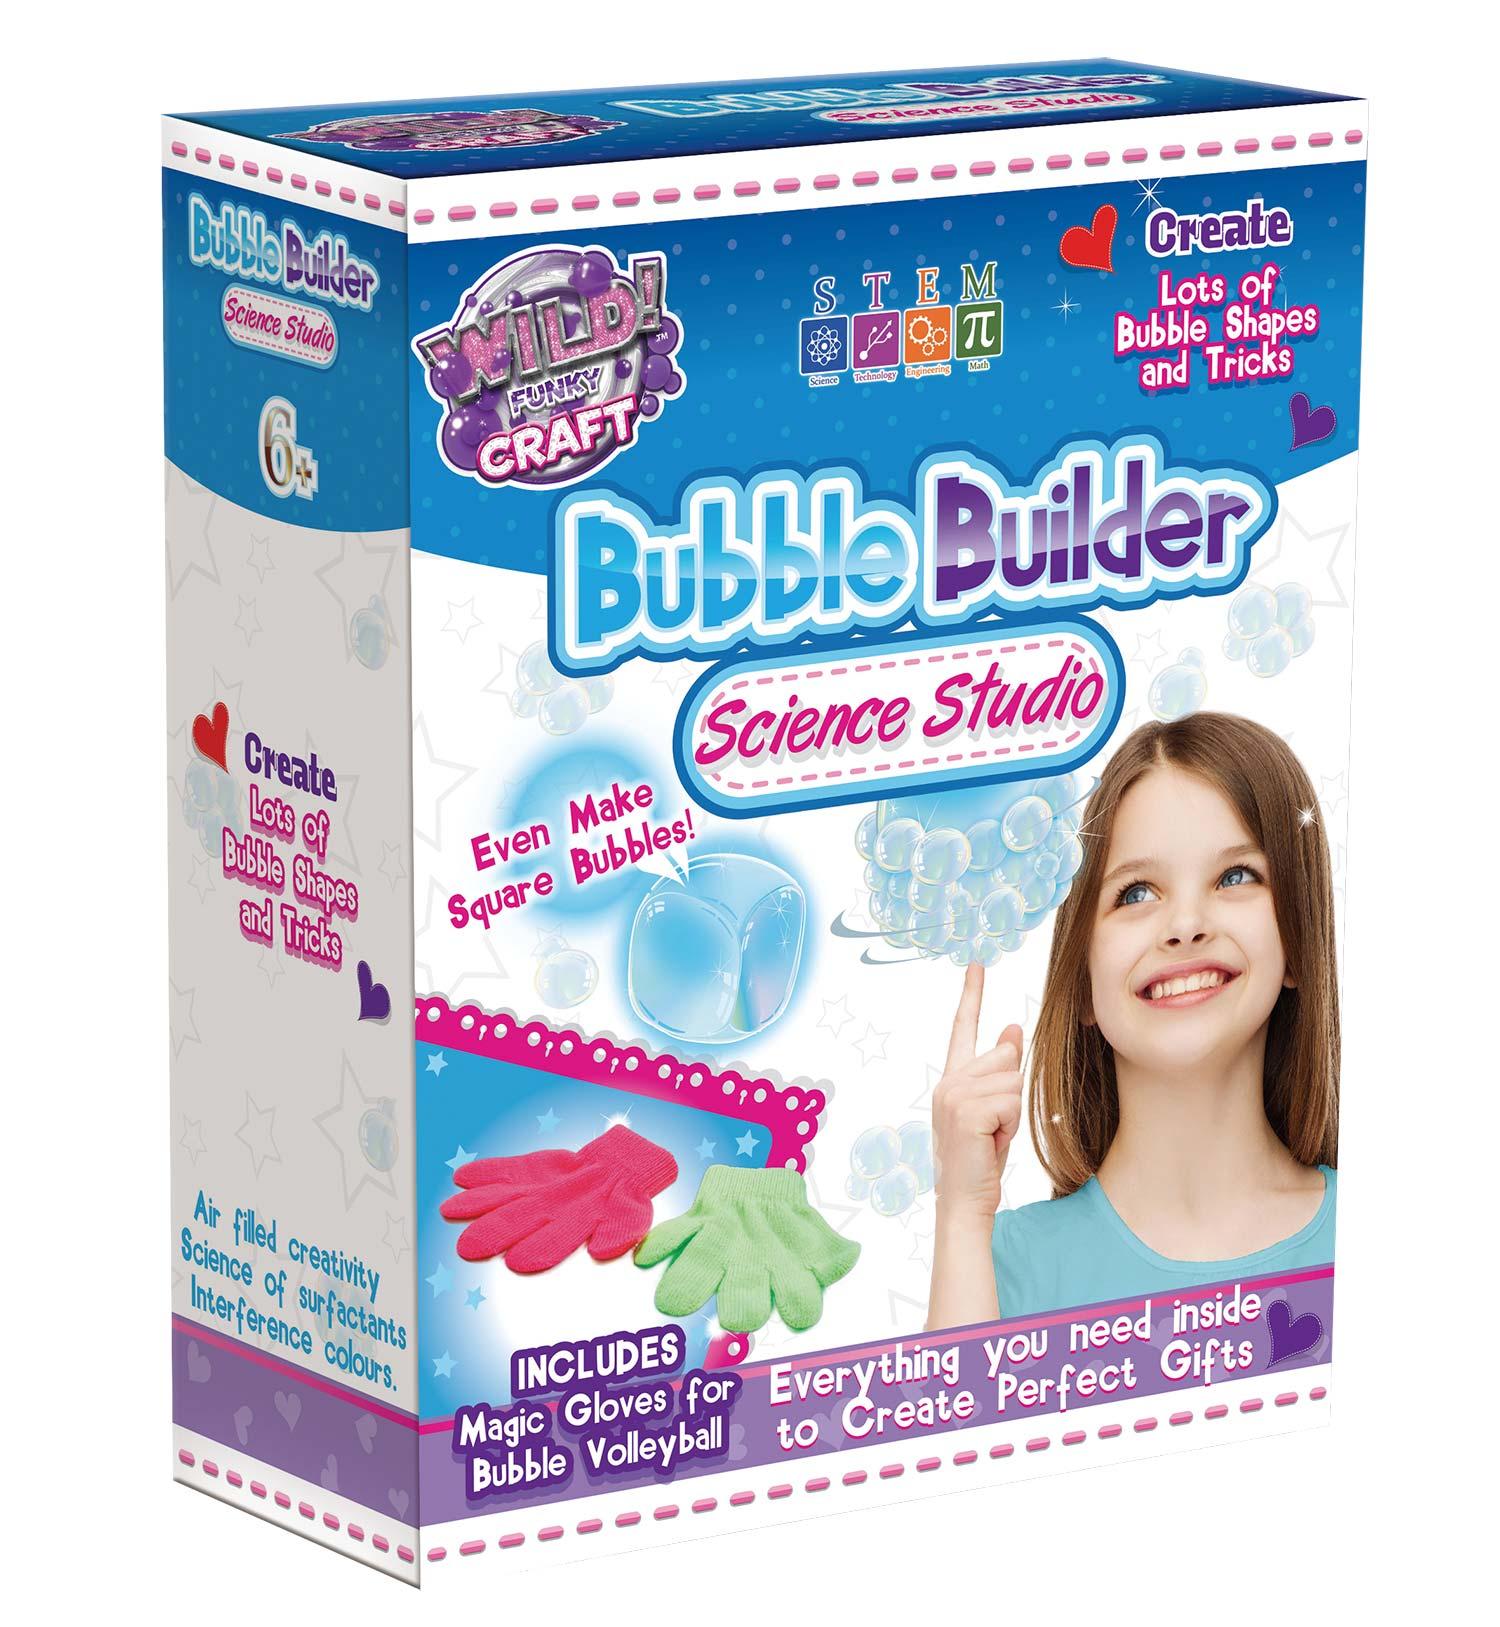 Bubble Builder Science Studio